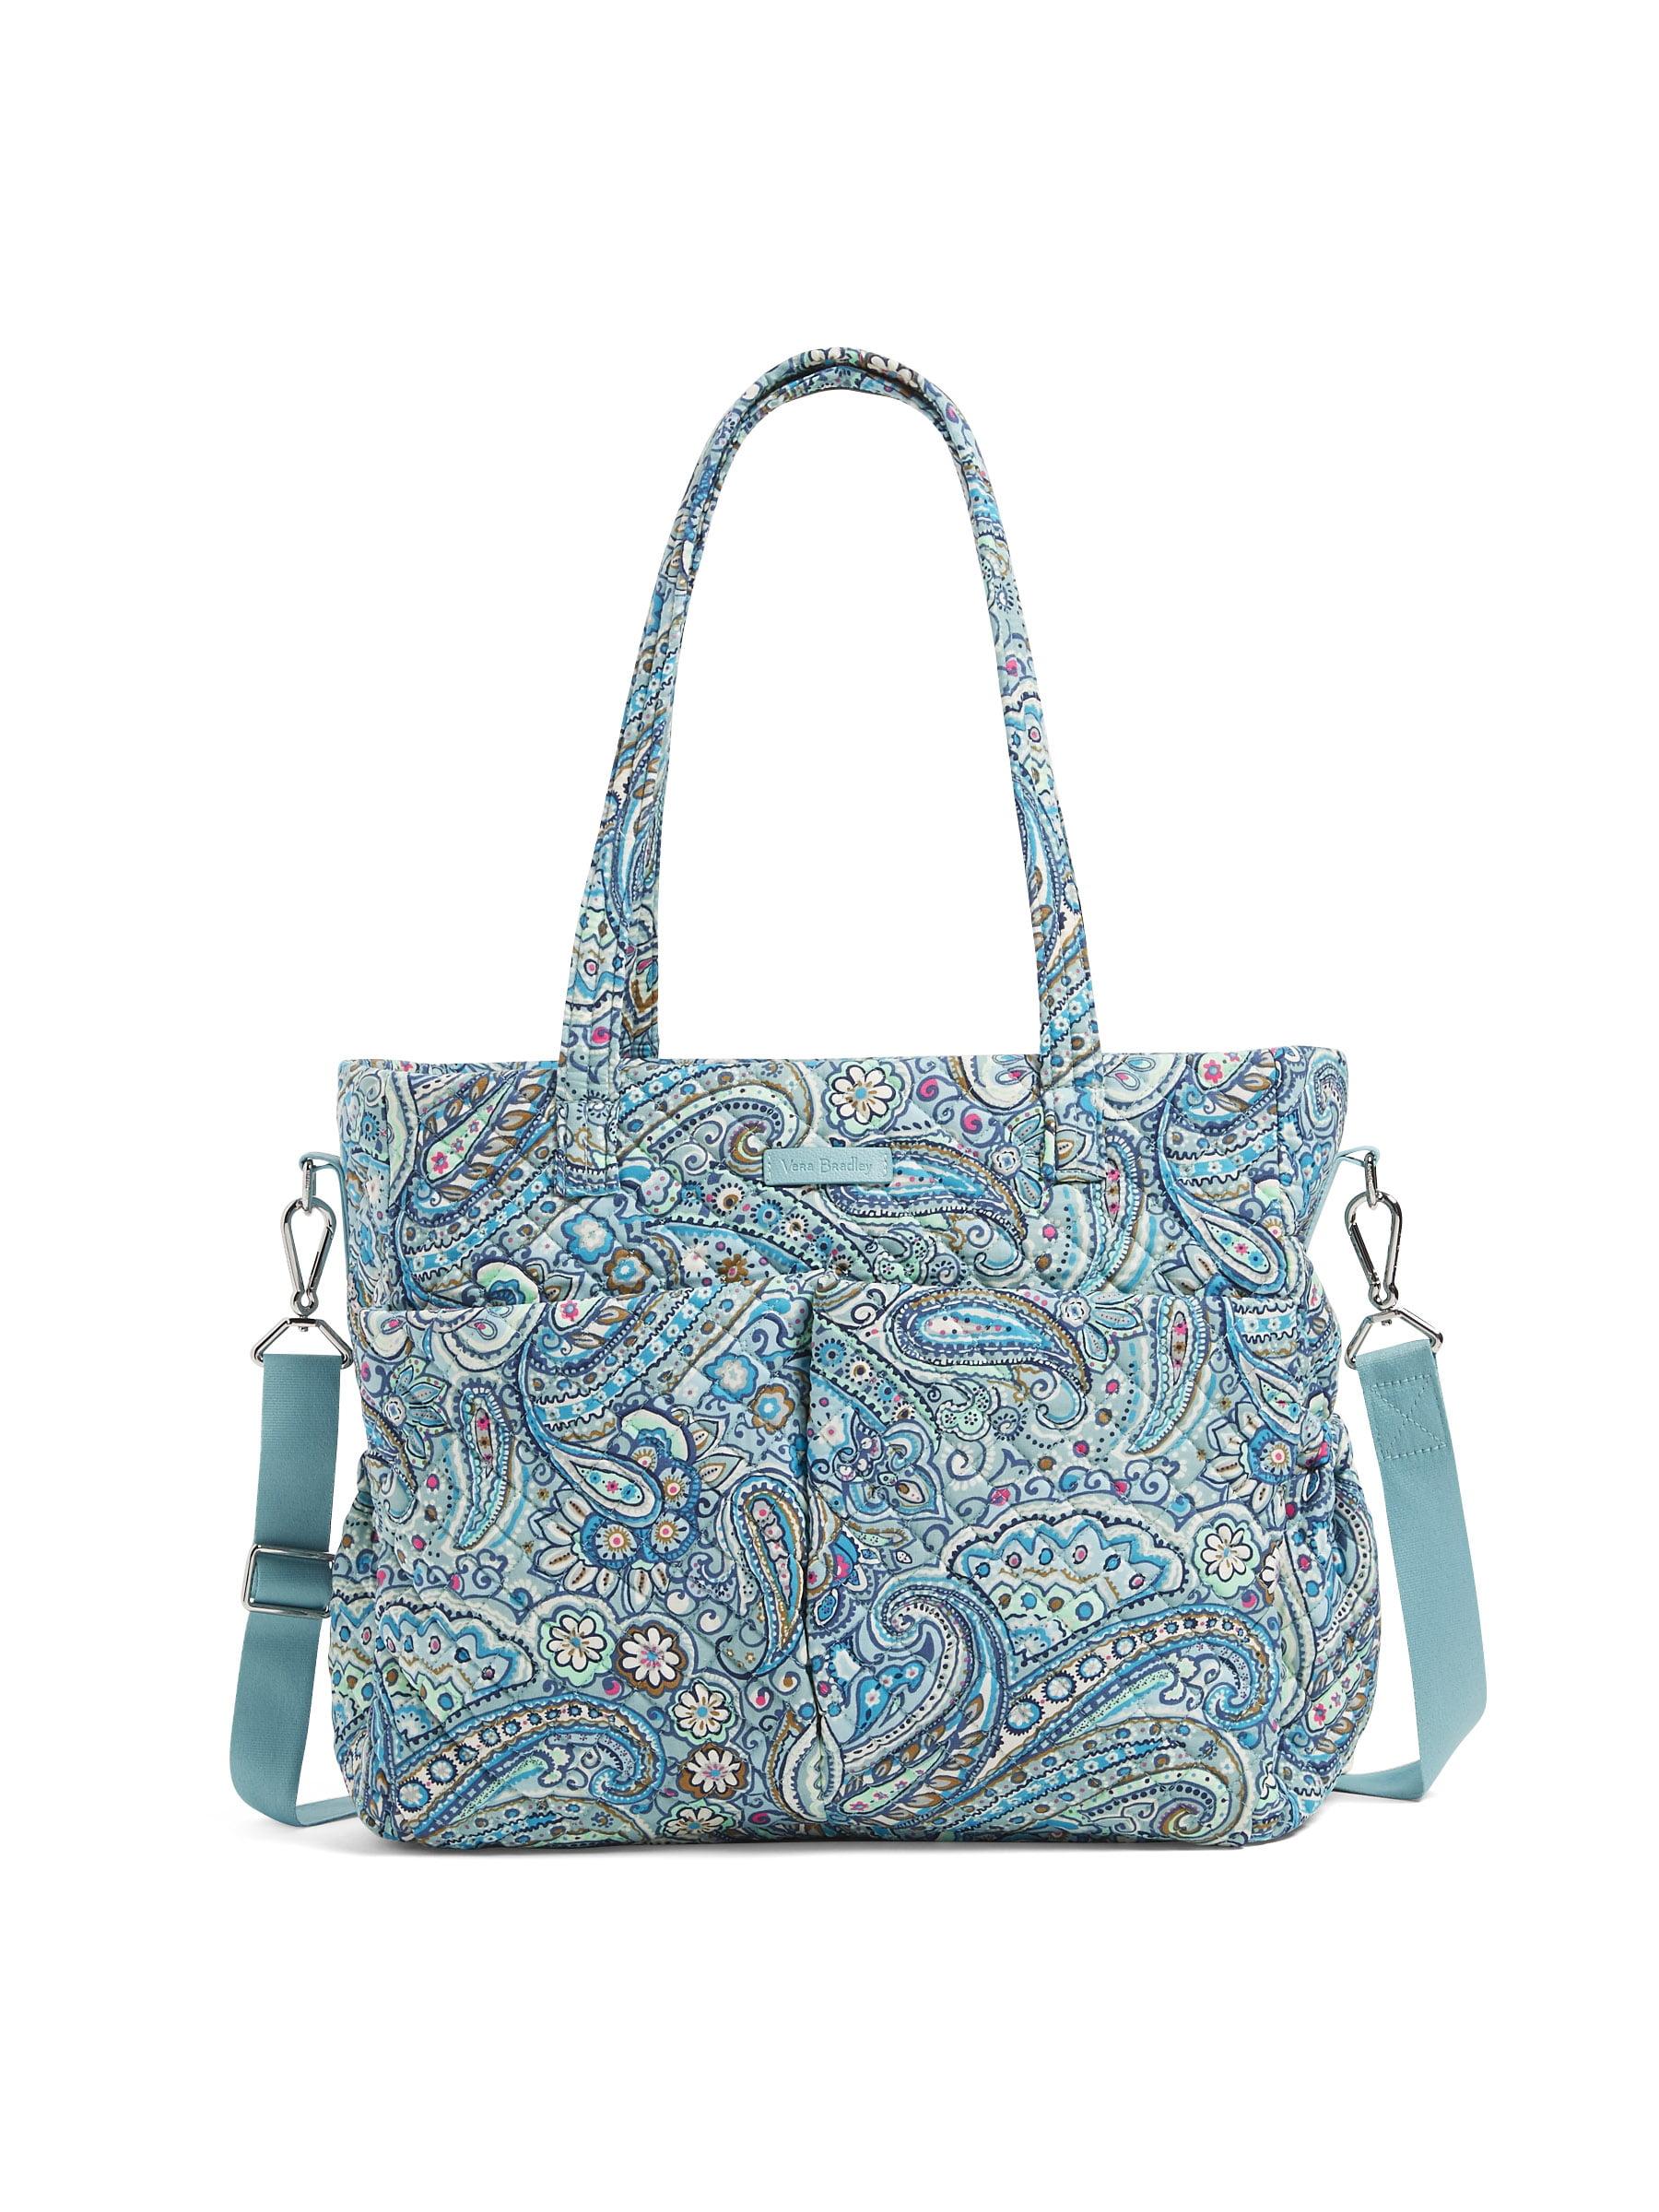 Vera Bradley - Iconic Ultimate Baby Bag - Walmart.com c94620ea8cd28